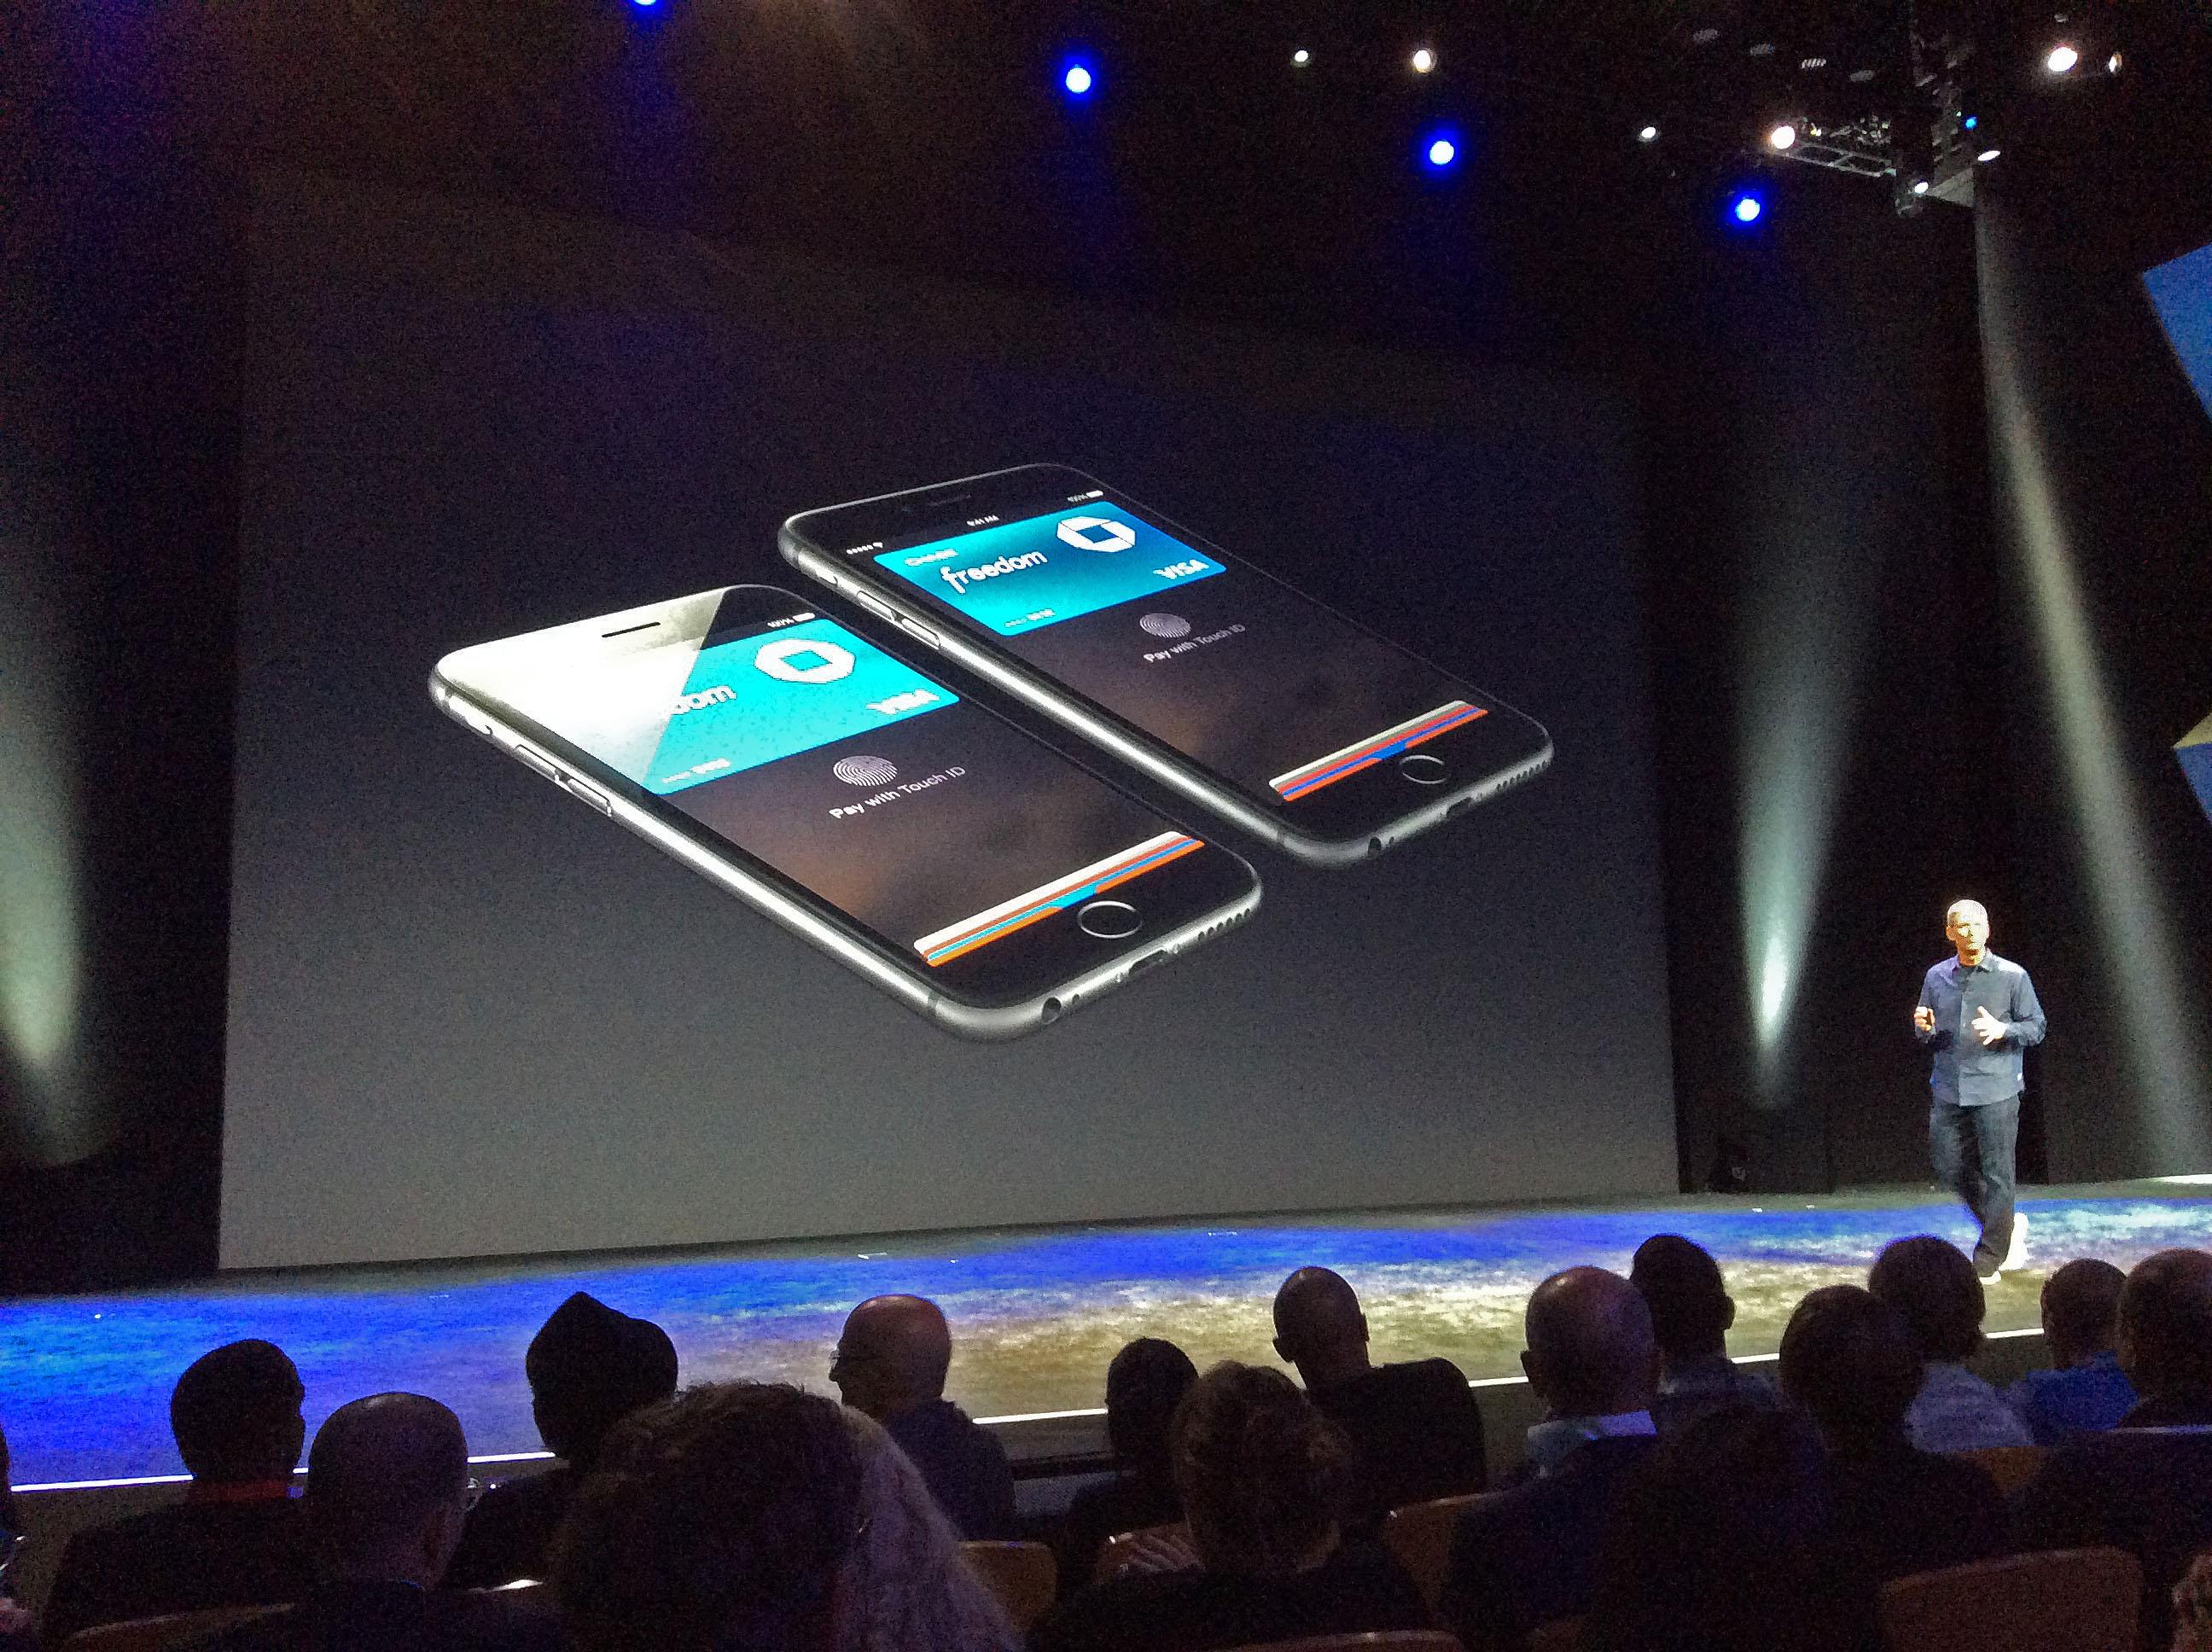 Avin_Arumugam_post_Tim_Cook_announcing_Apple_Pay